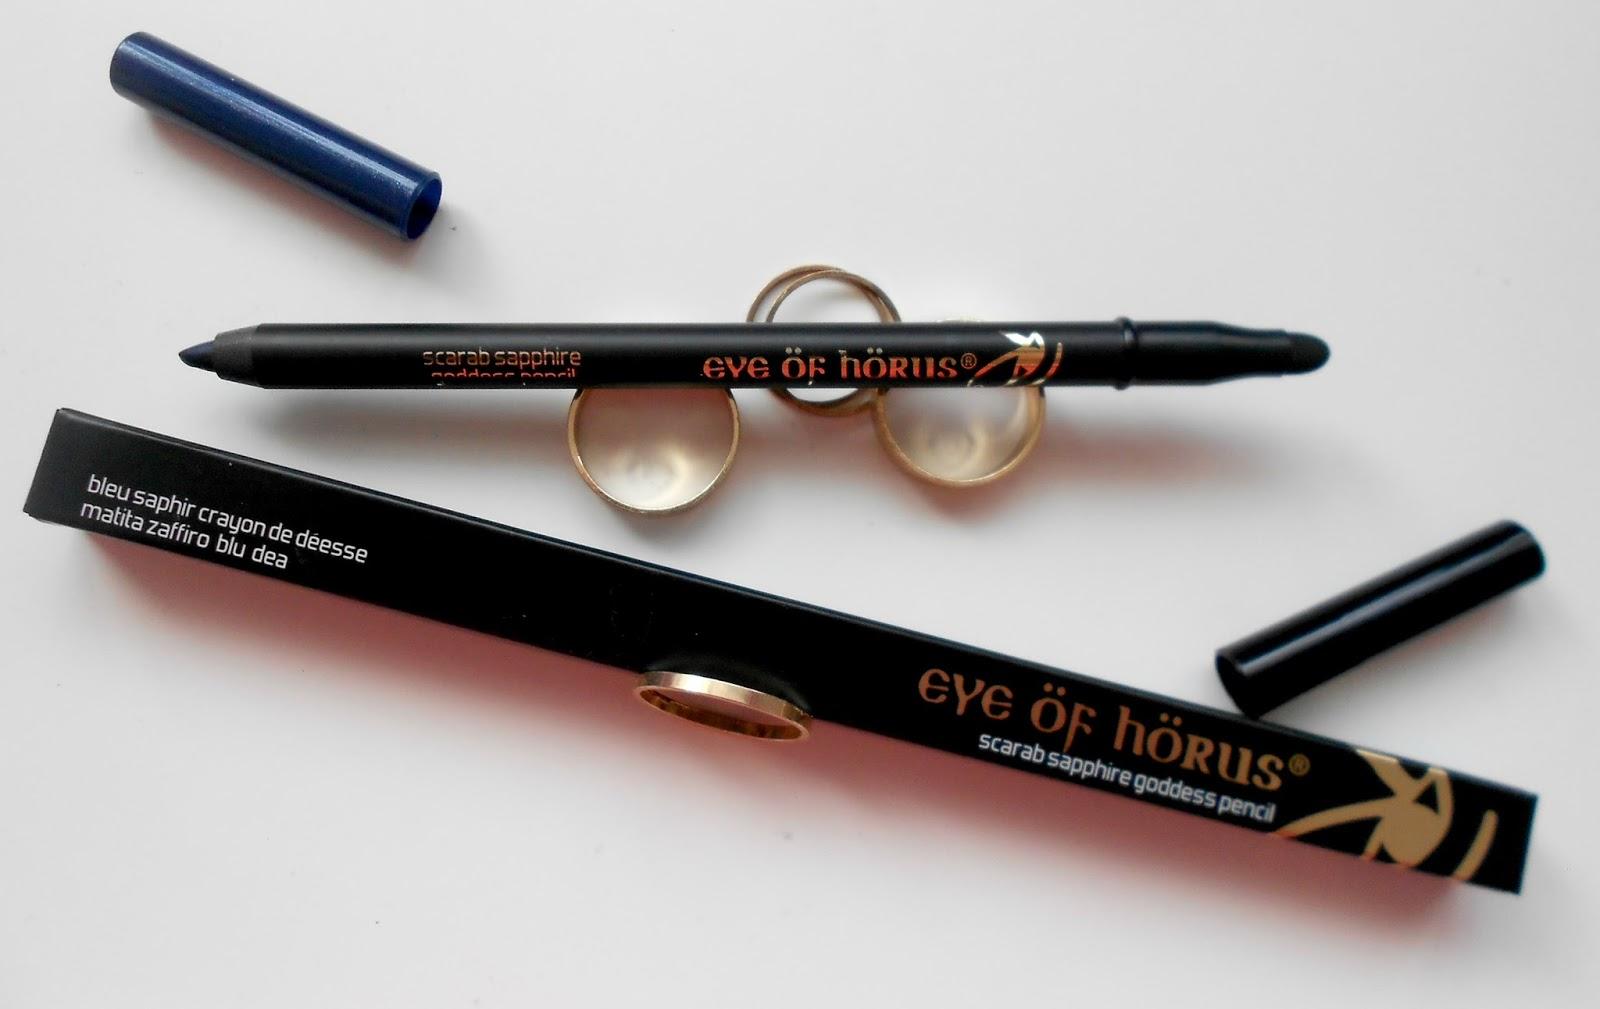 eye of horus eye pencil review